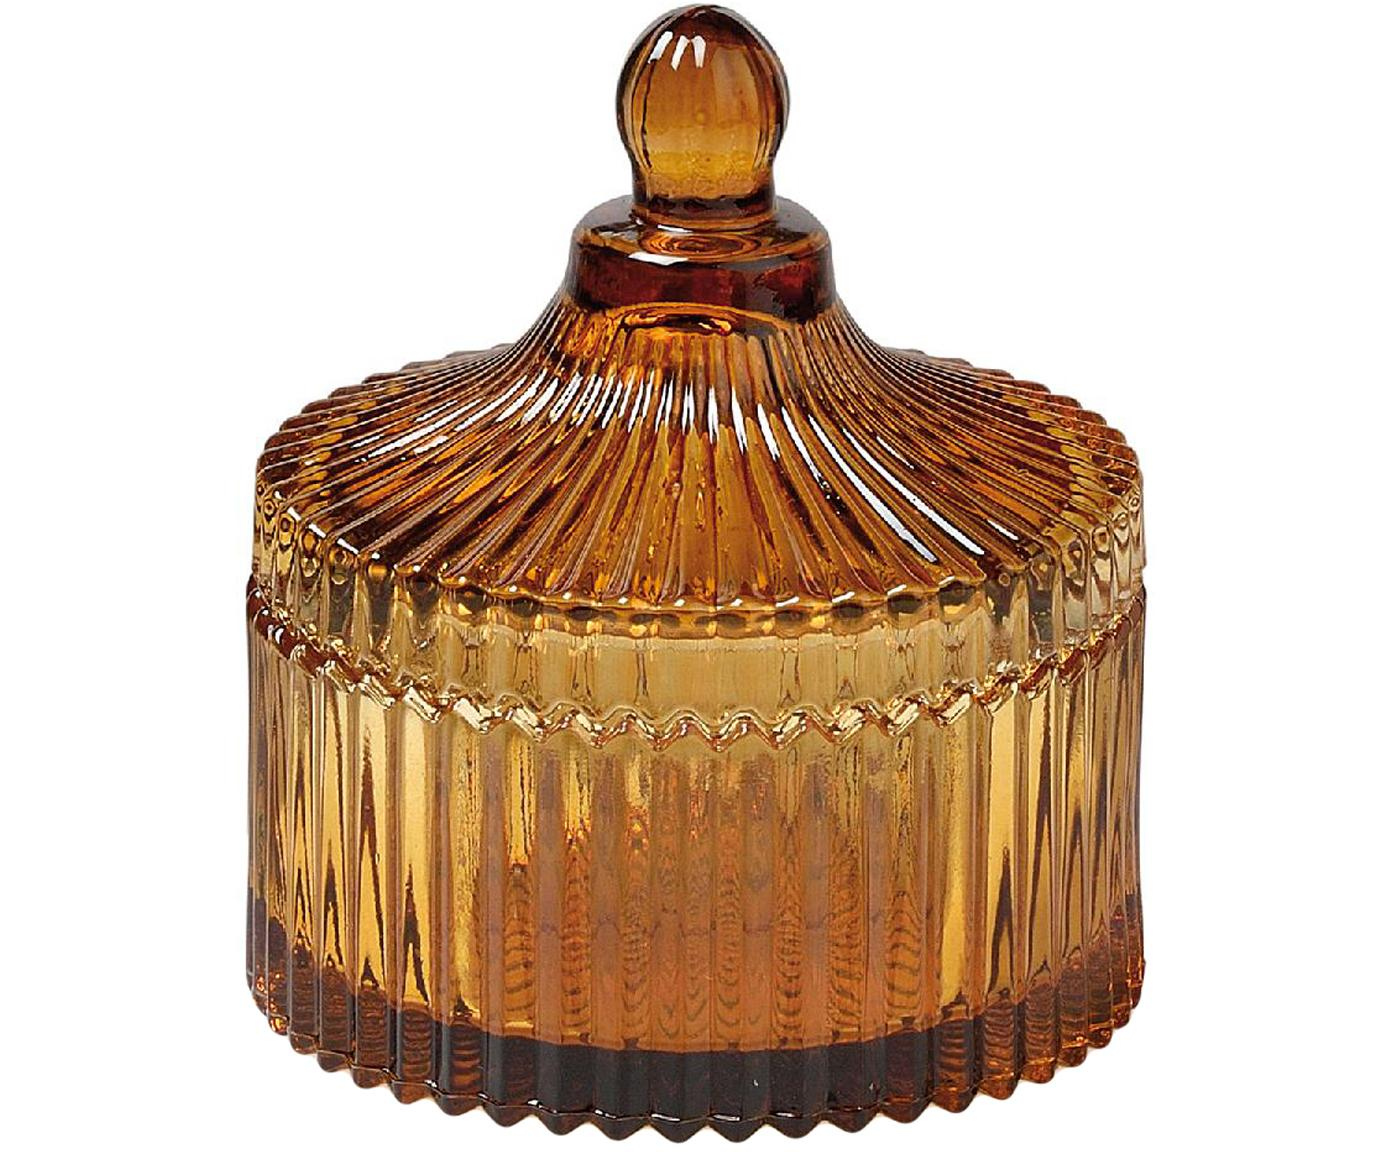 Opbergpot Ionic, Glas, Bruin, Ø 11 x H 12 cm